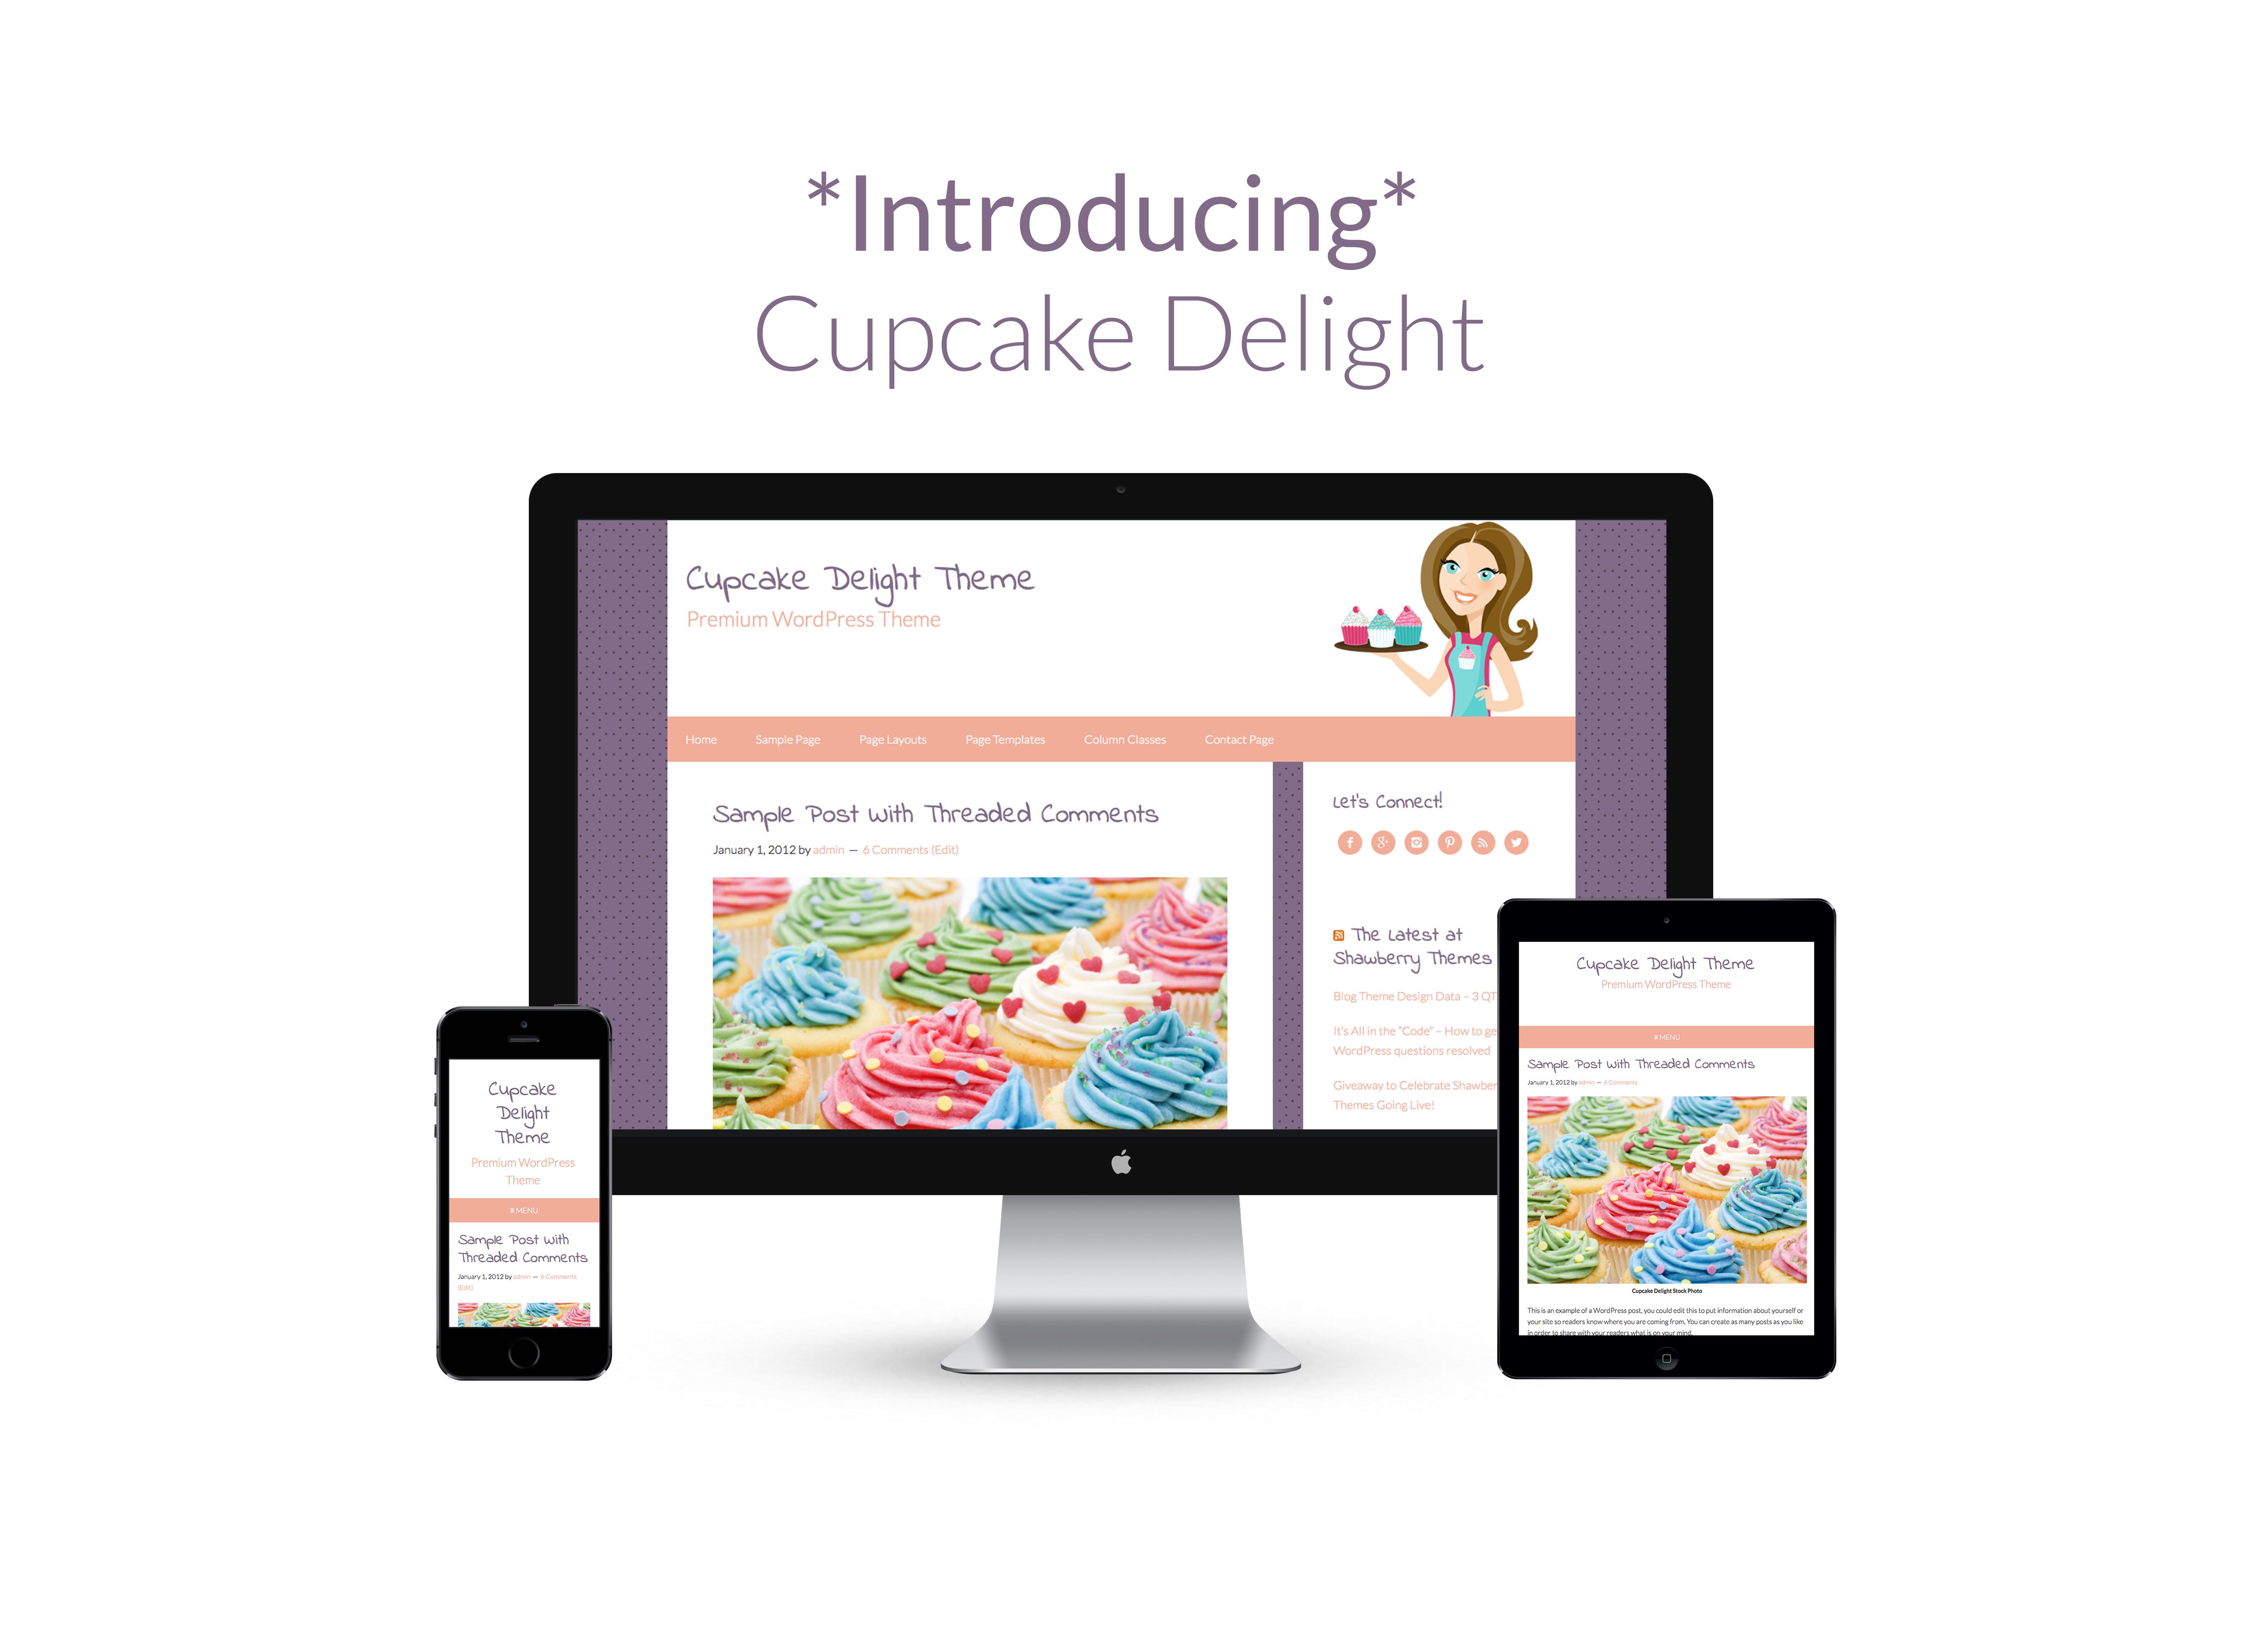 Cupcake Delight Premium WordPress Theme